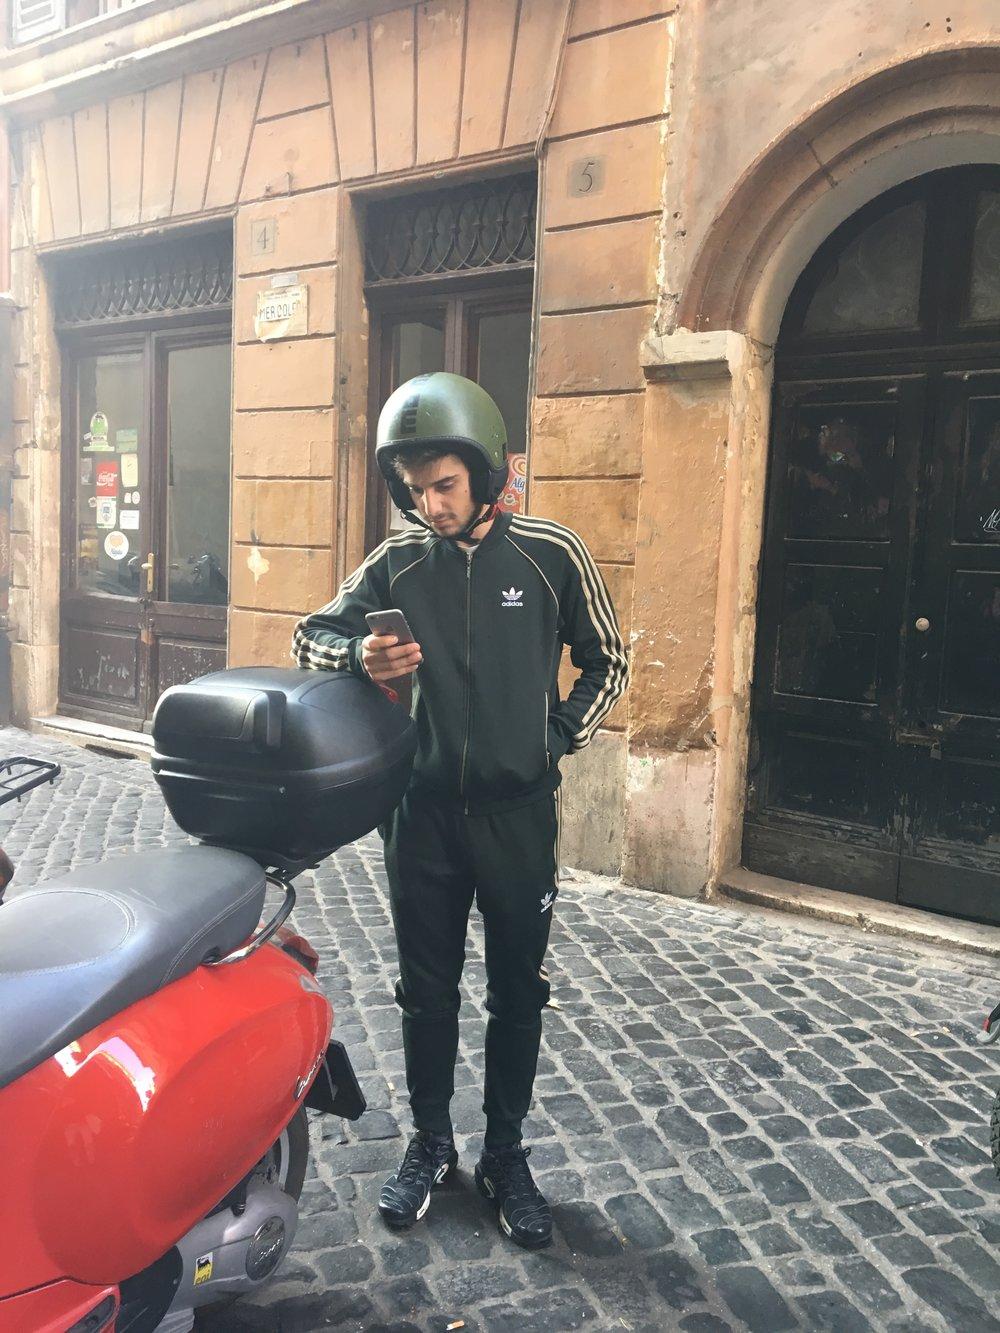 Regola, Rome